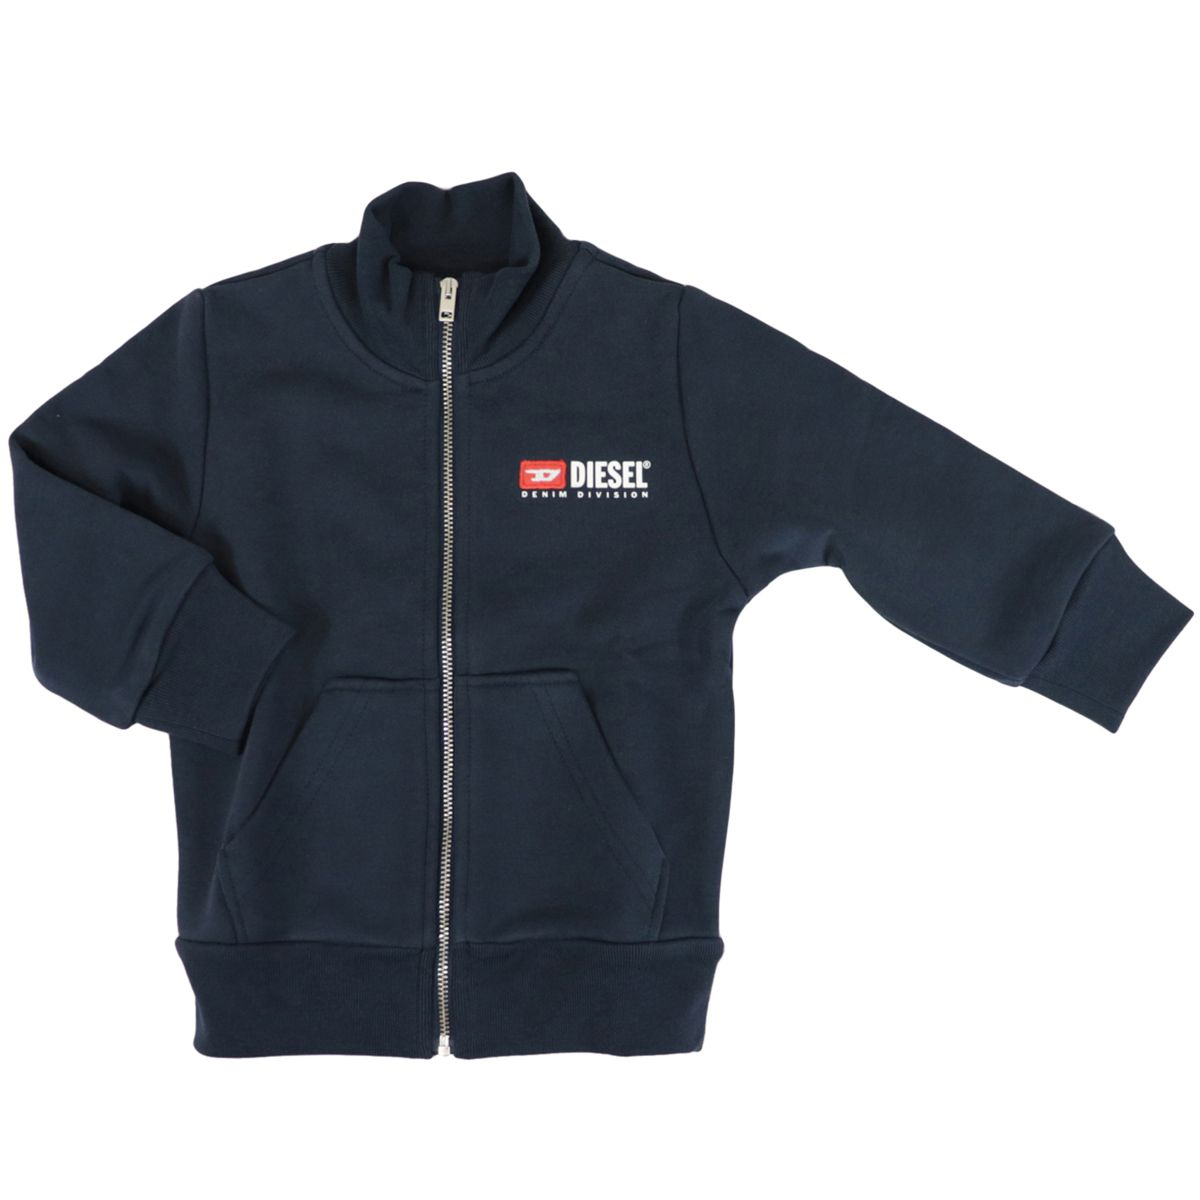 Full zip cotton sweatshirt with logo patch Blue Diesel